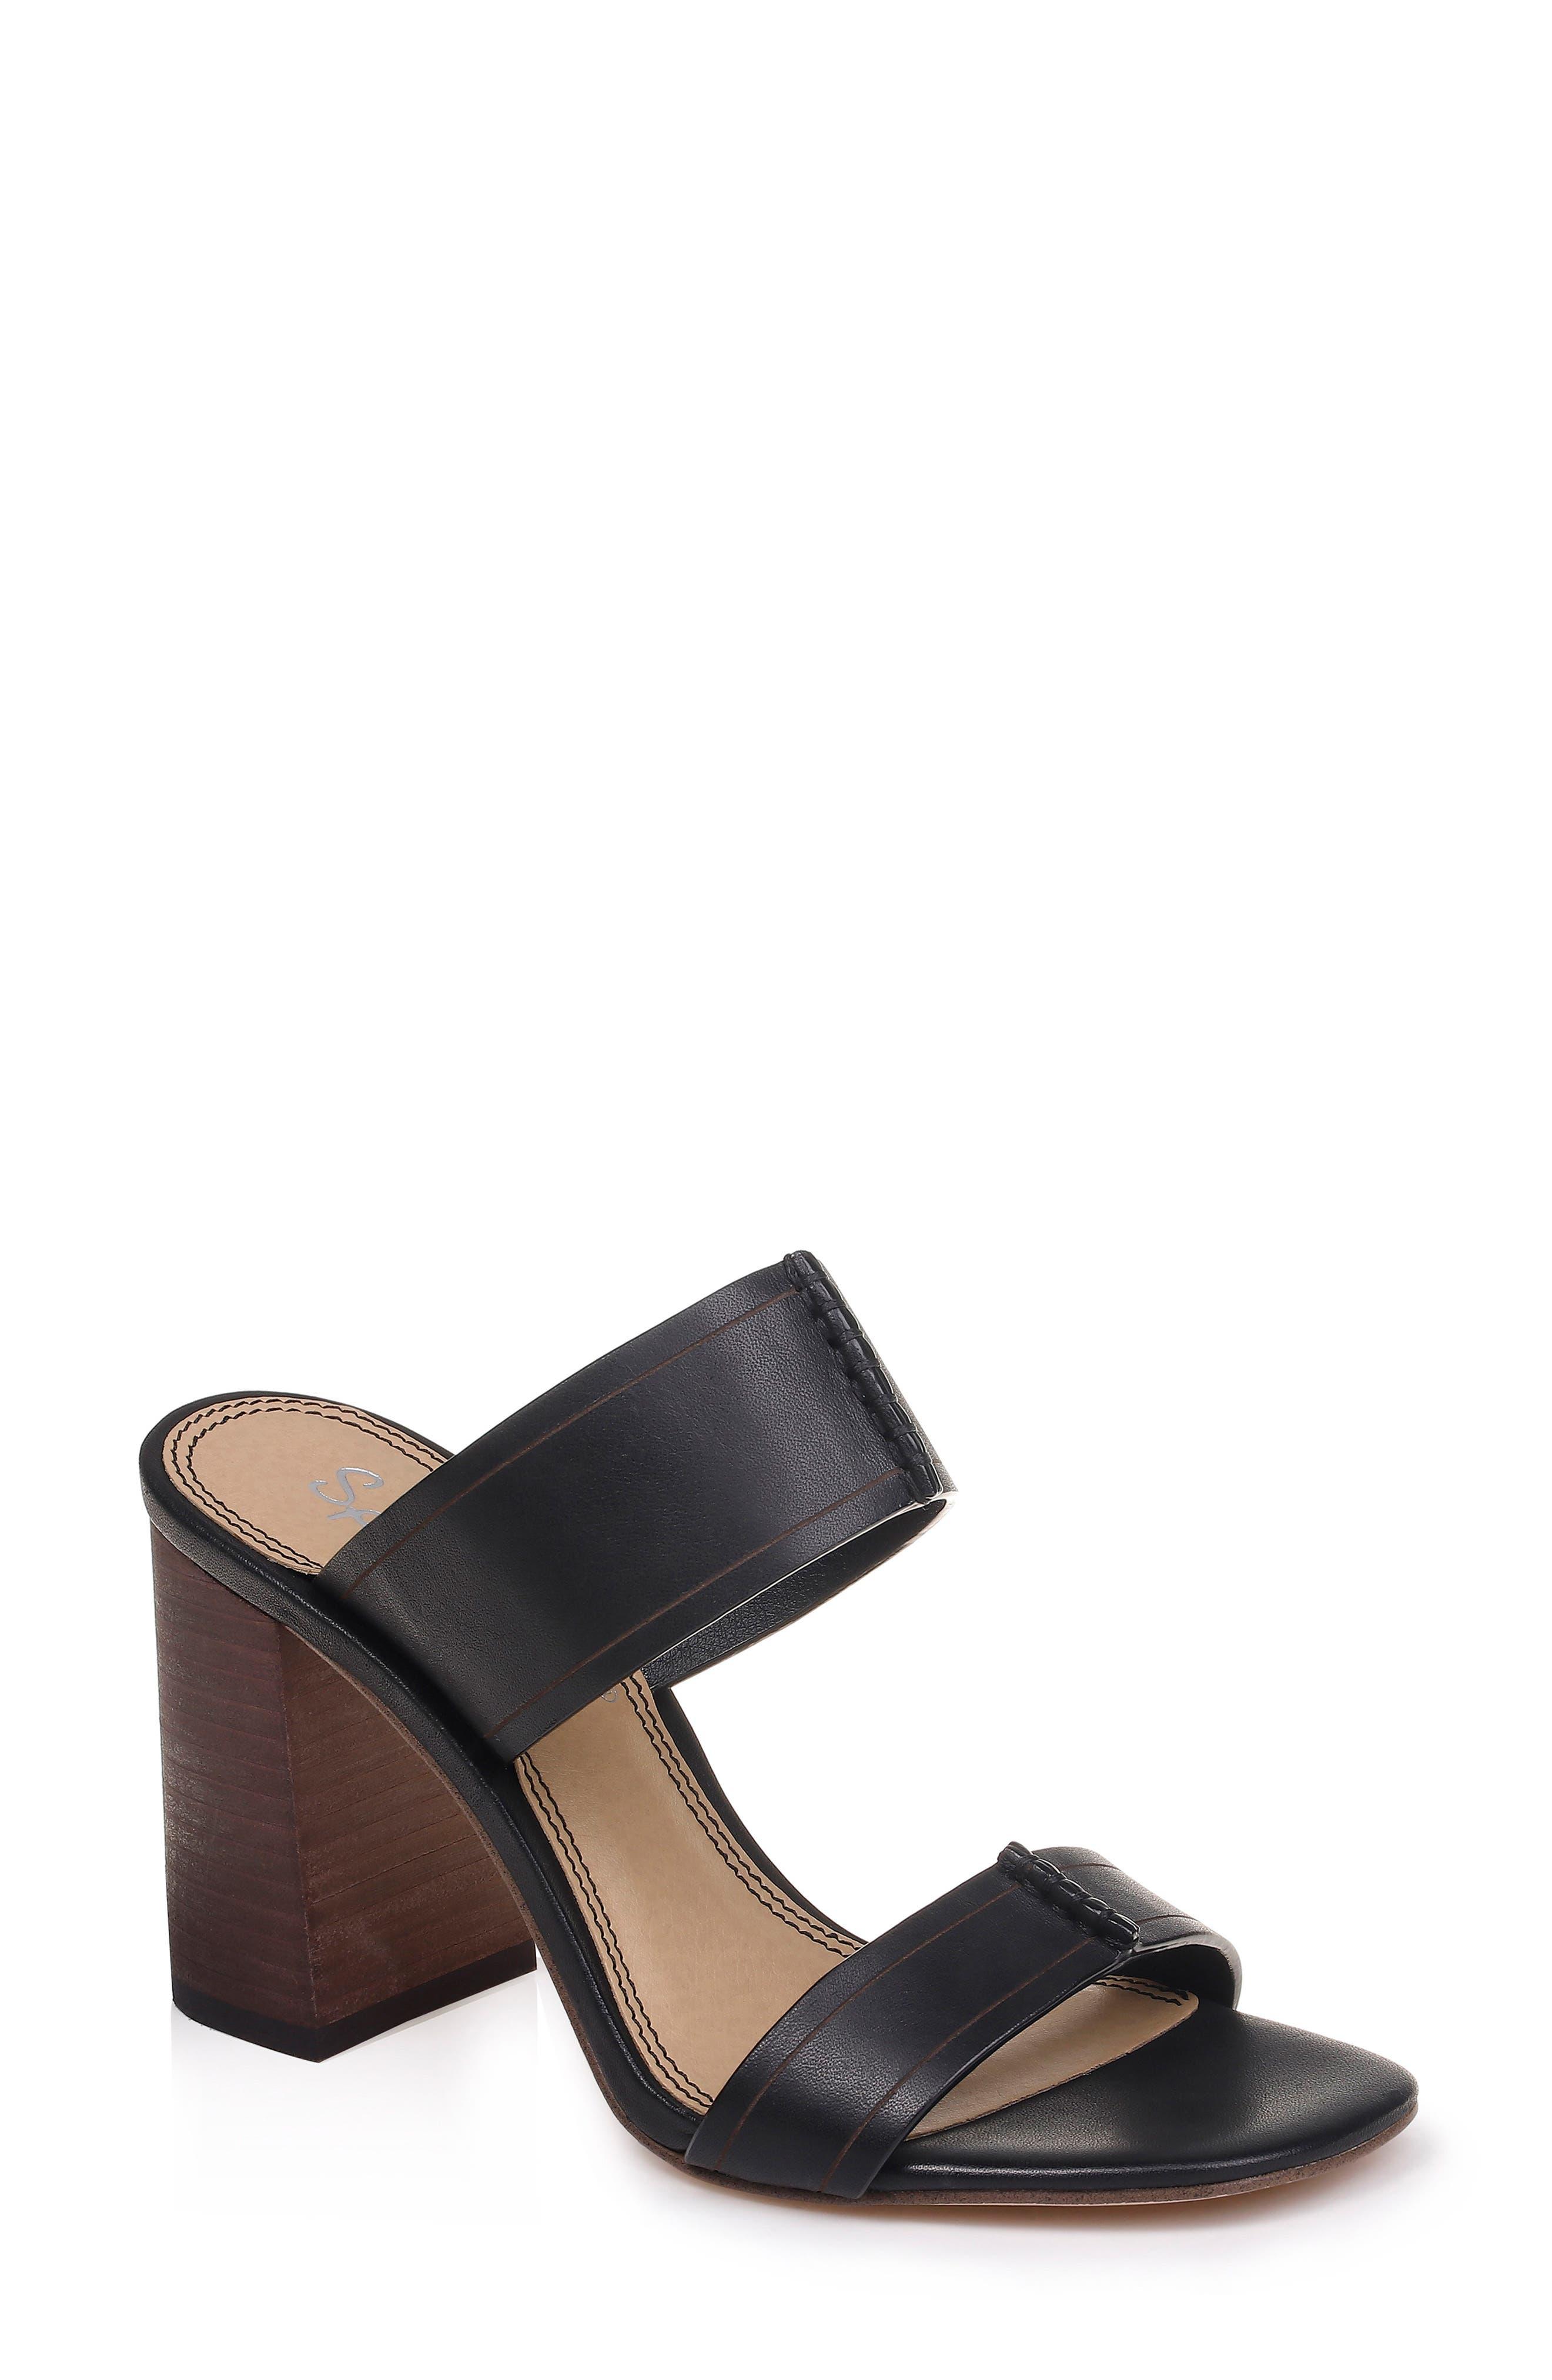 SPLENDID, Tacy Slide Sandal, Main thumbnail 1, color, BLACK LEATHER